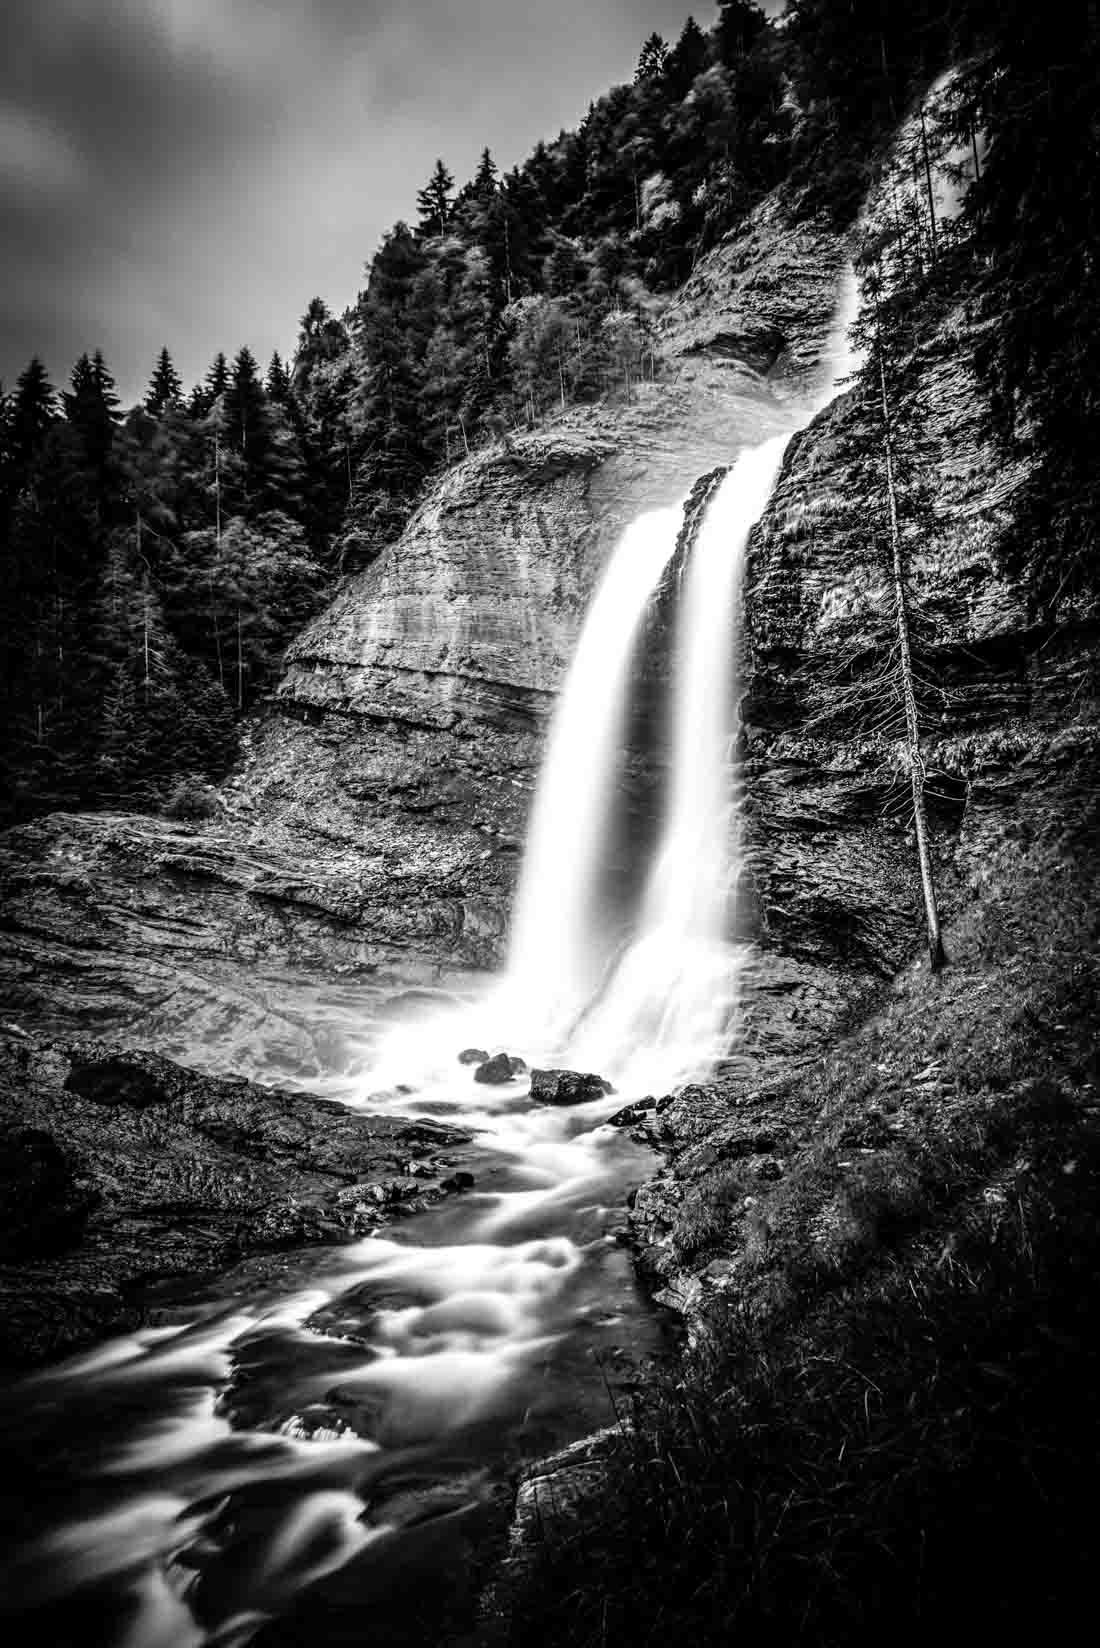 cascade du rouget waterfall haute savoie sixt fer cheval salvagny 74 france alpes française noir et blanc b&w black and white robin favier photographies fine art